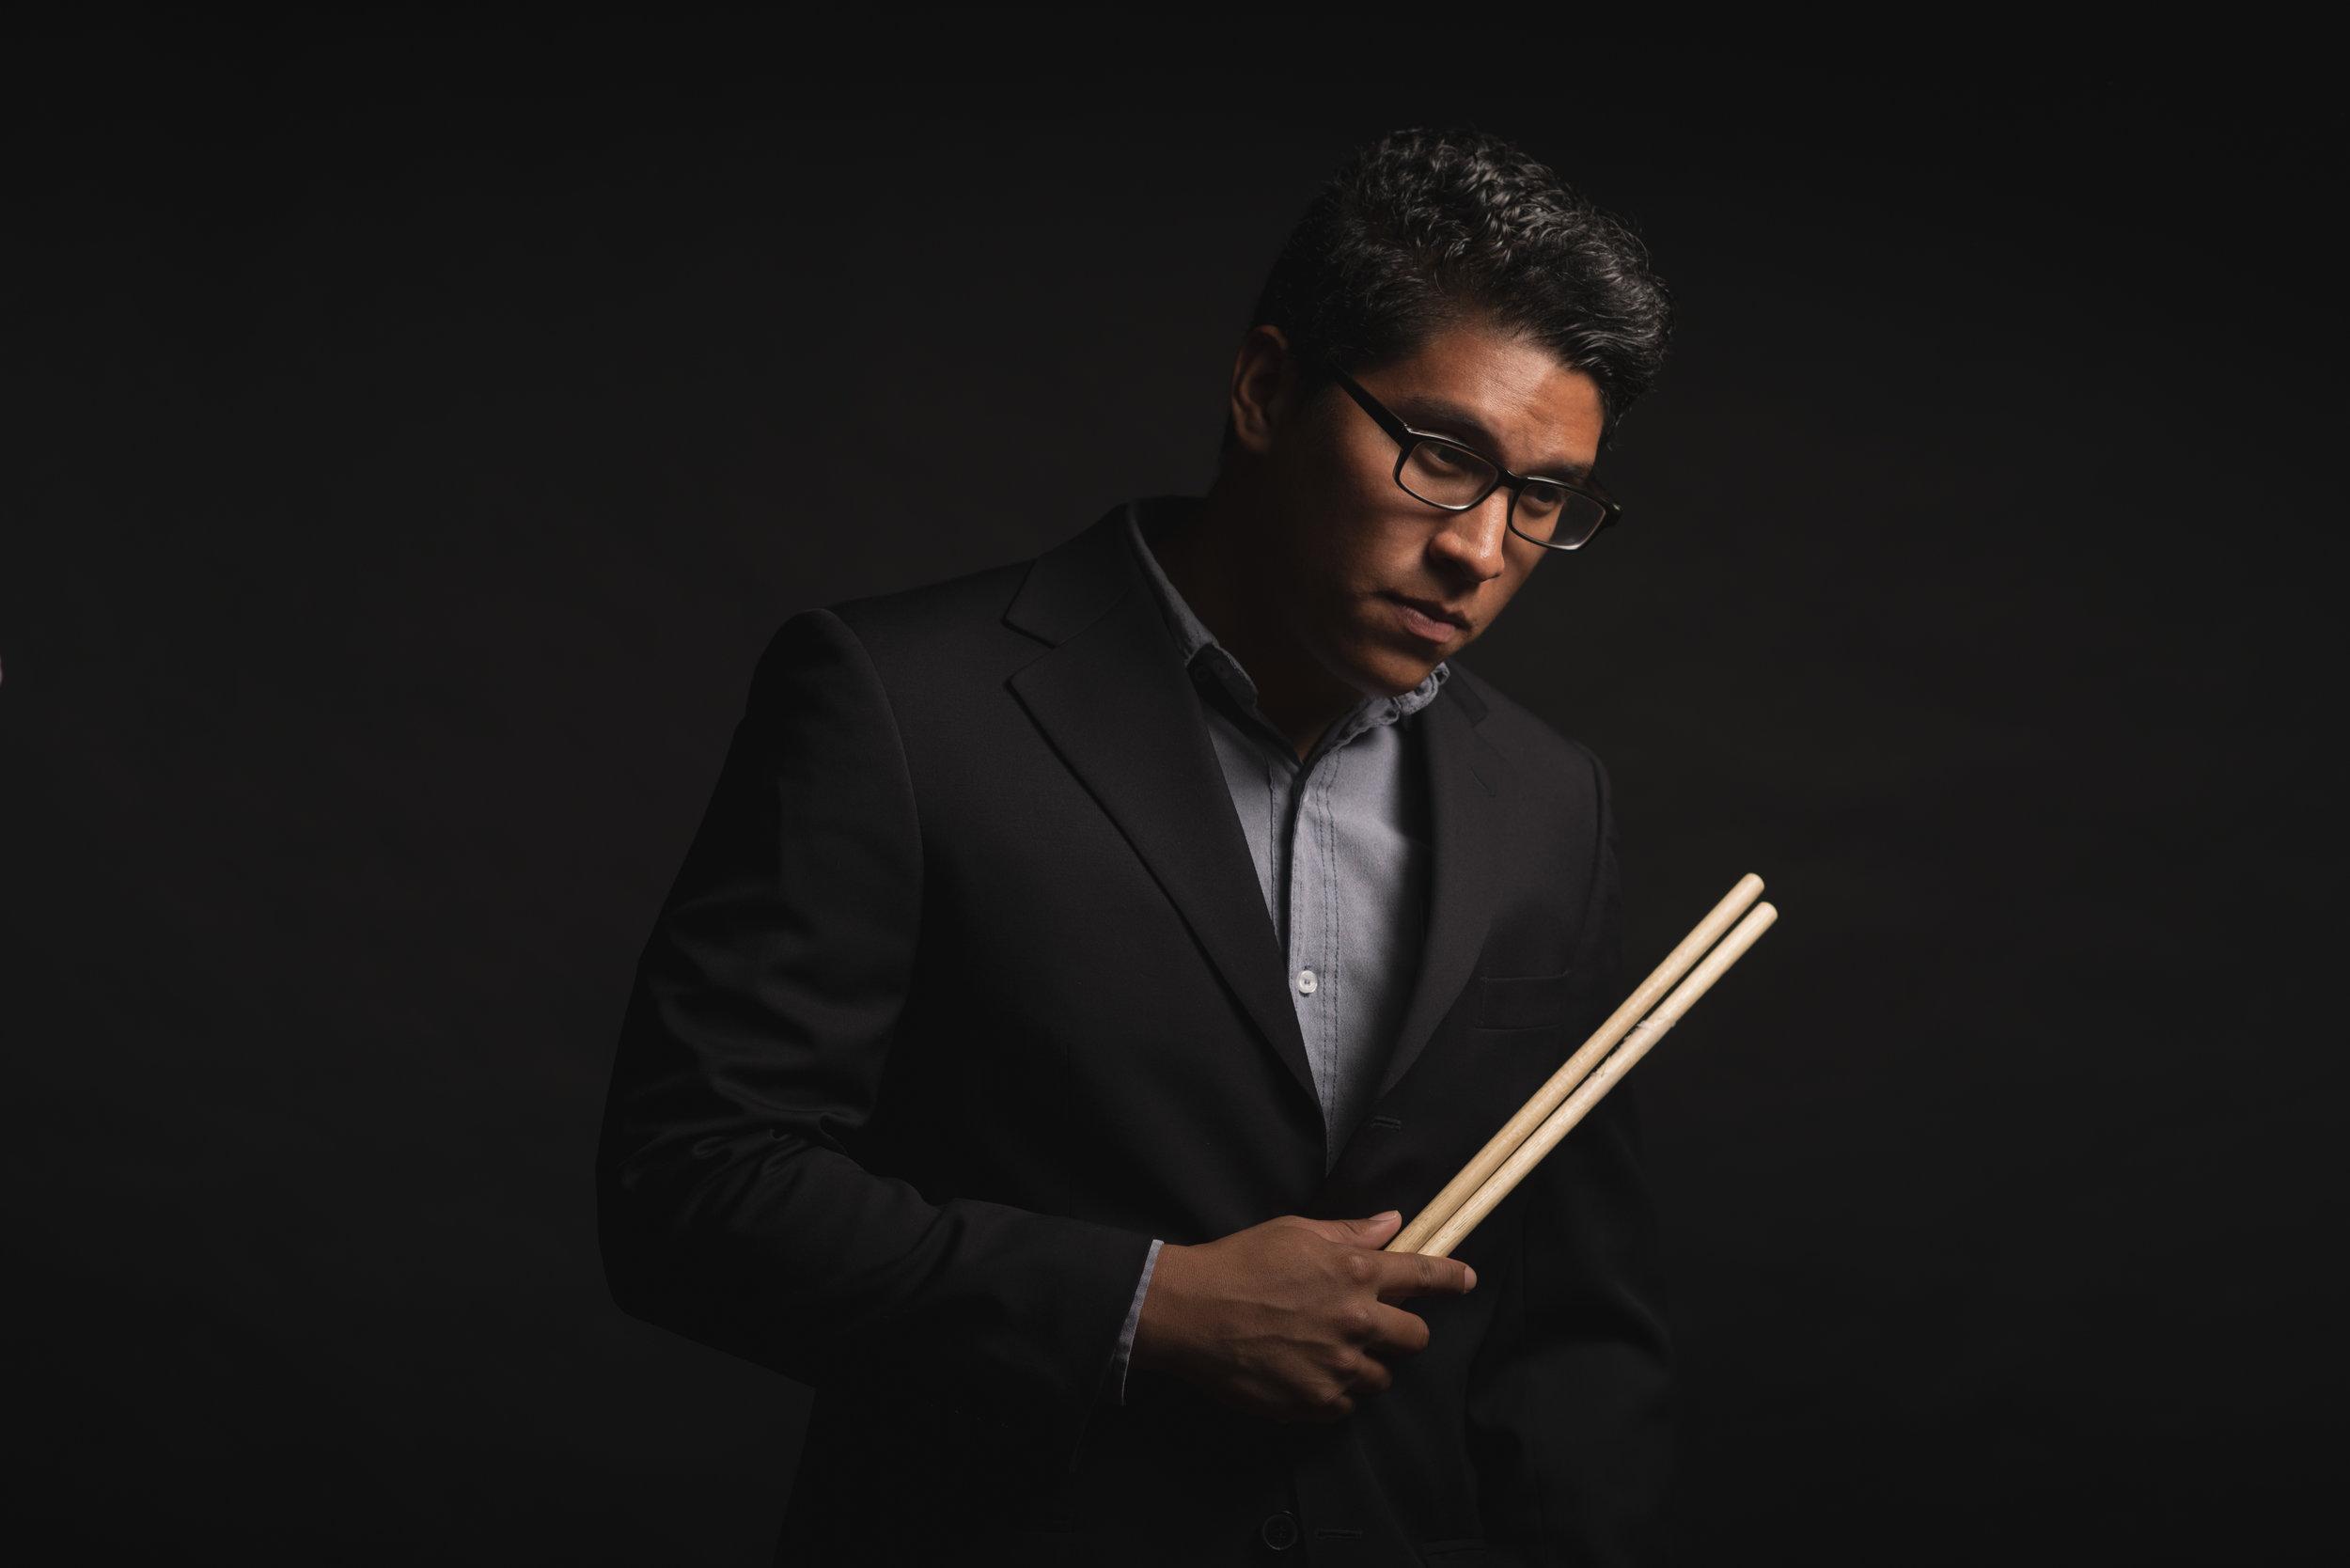 Pedro Sanjur